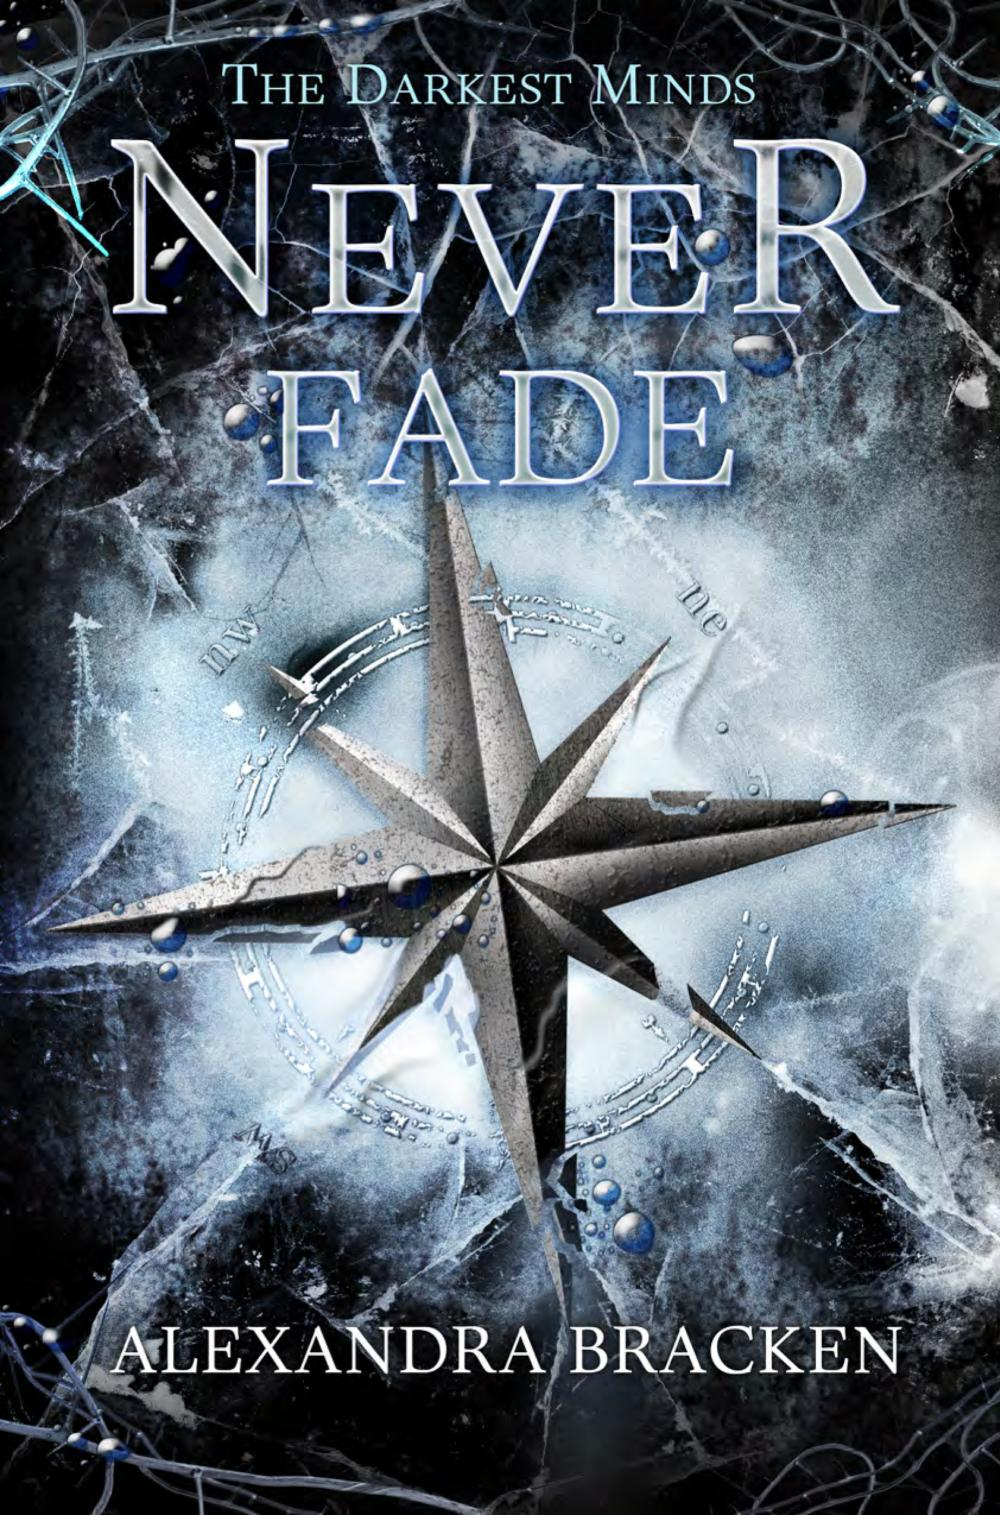 Never Fade by Alexandra Bracken (Darkest Minds #2, Audio)  Amazon  |  Goodreads